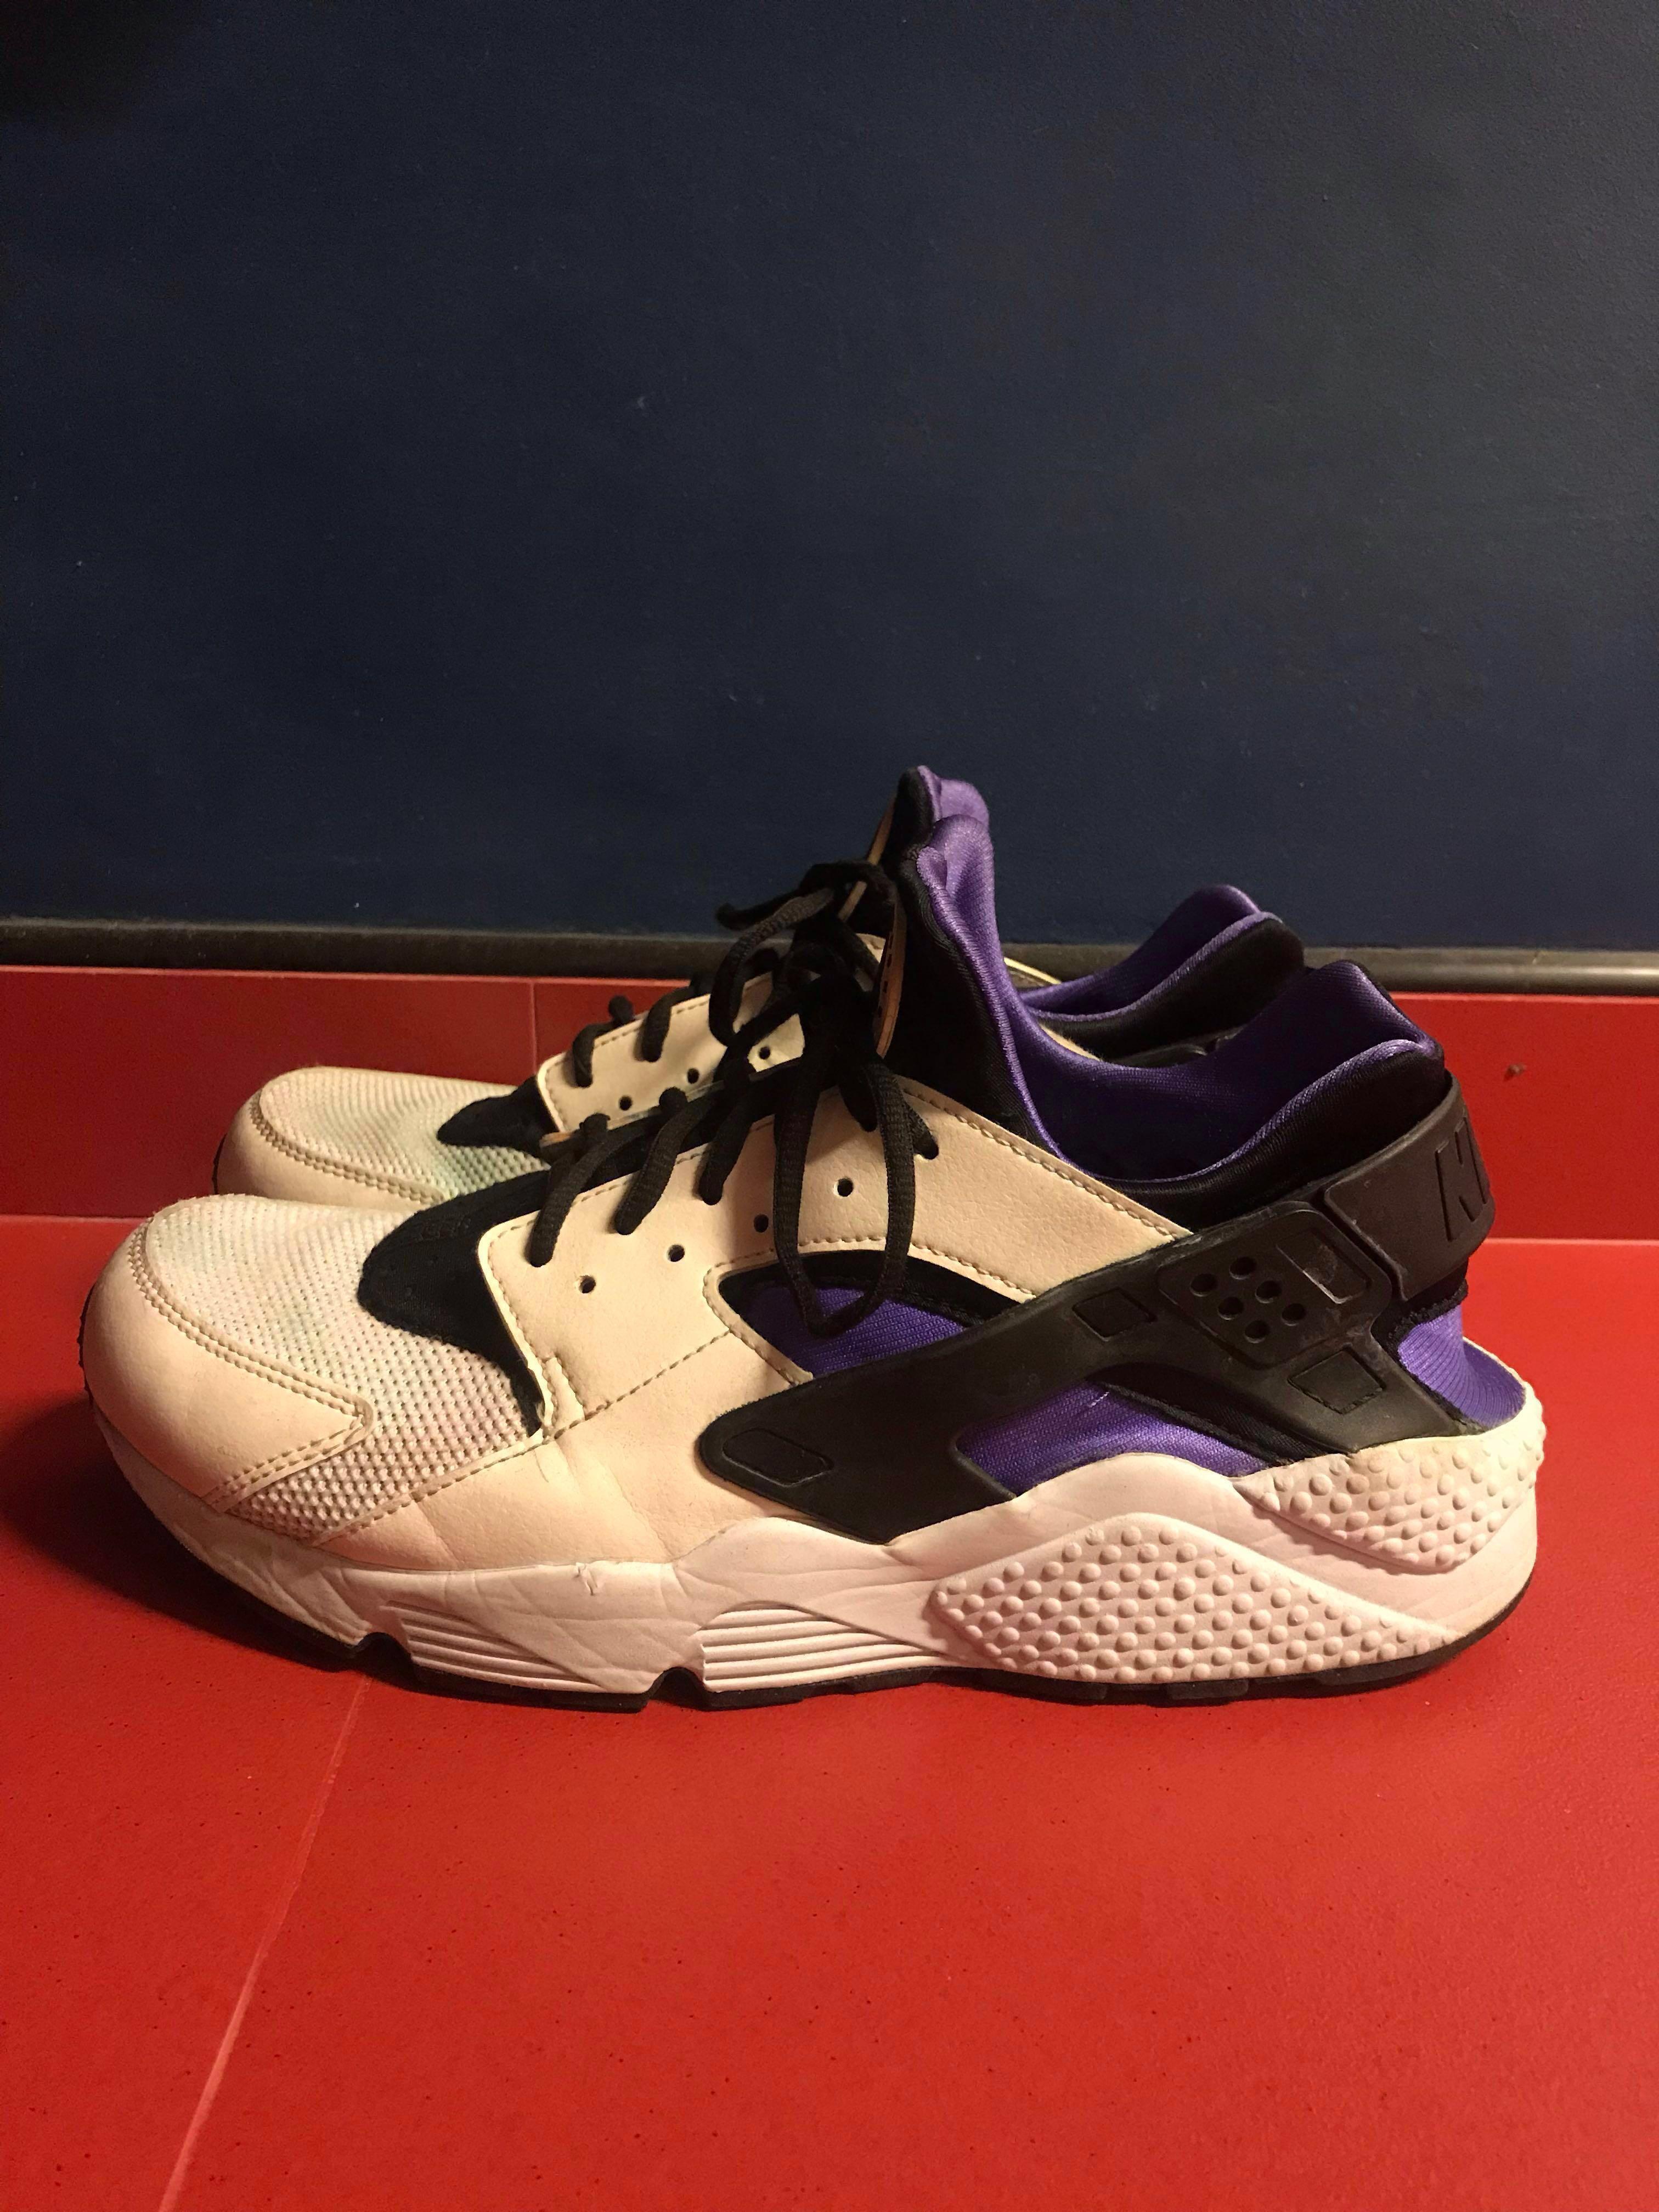 low priced cf88c 8d79c Nike Huarache (OG Purple) 💥, Men's Fashion, Footwear ...